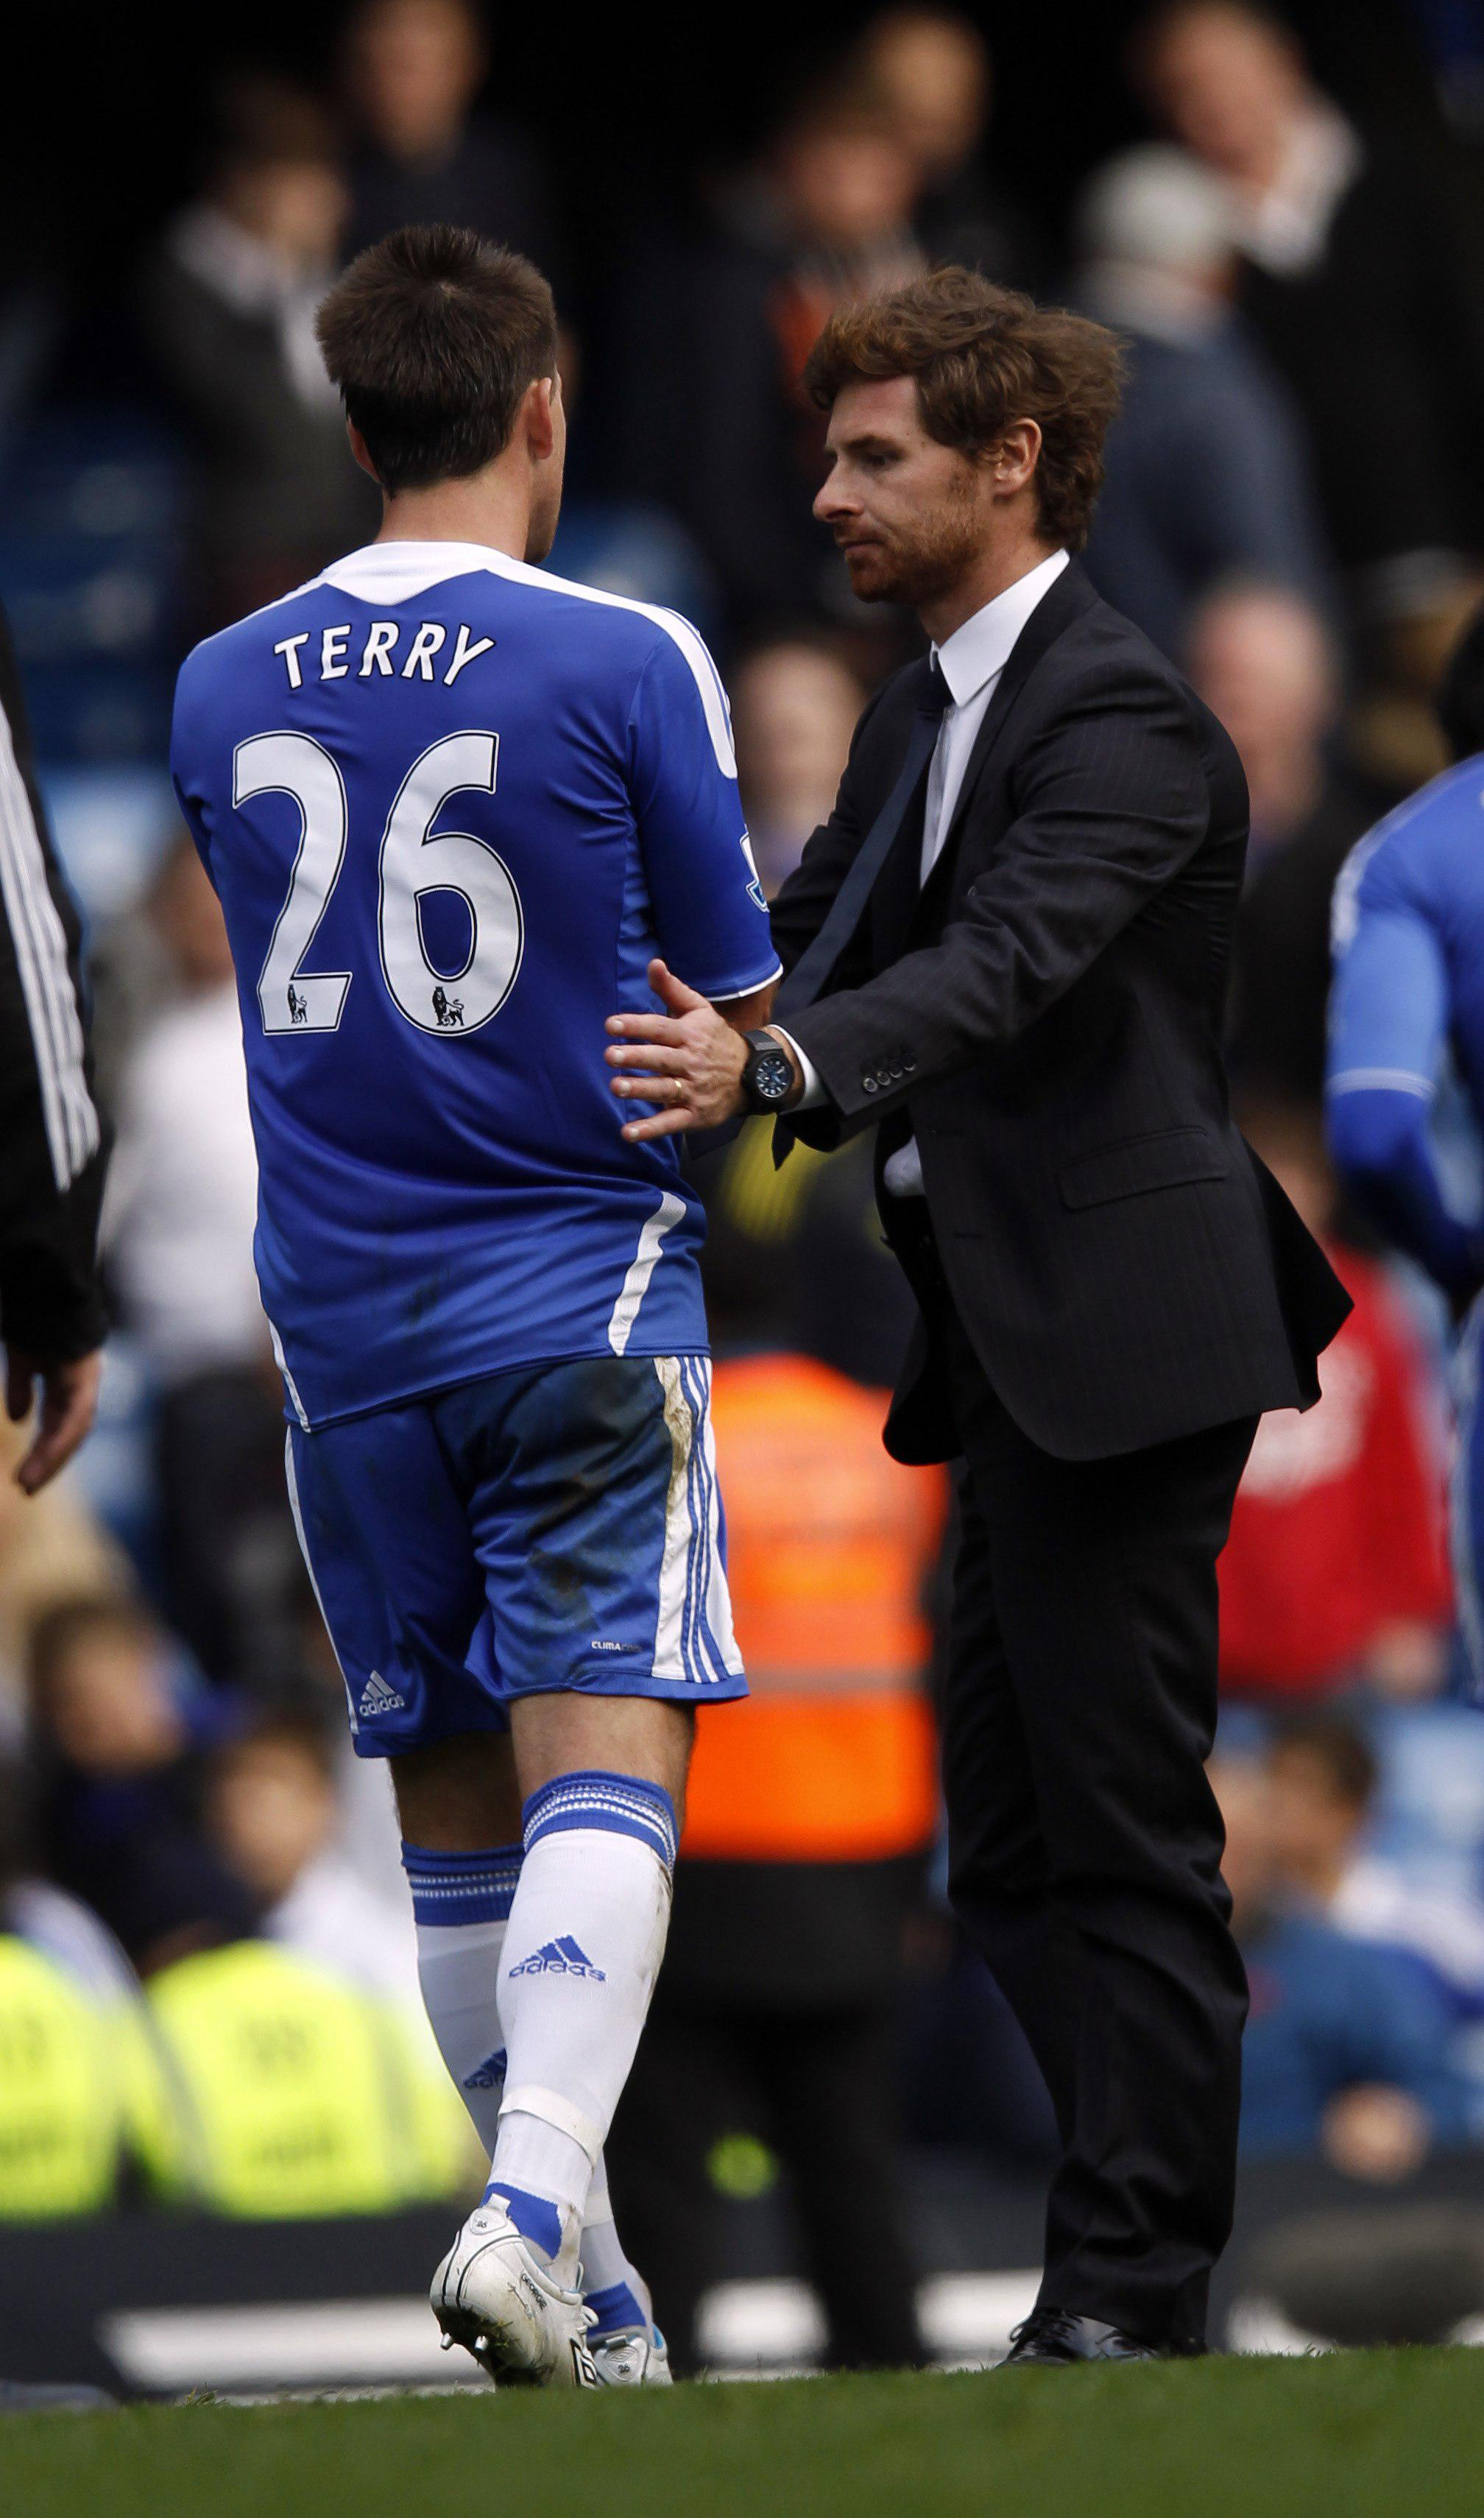 Now we know how AVB felt at Chelsea